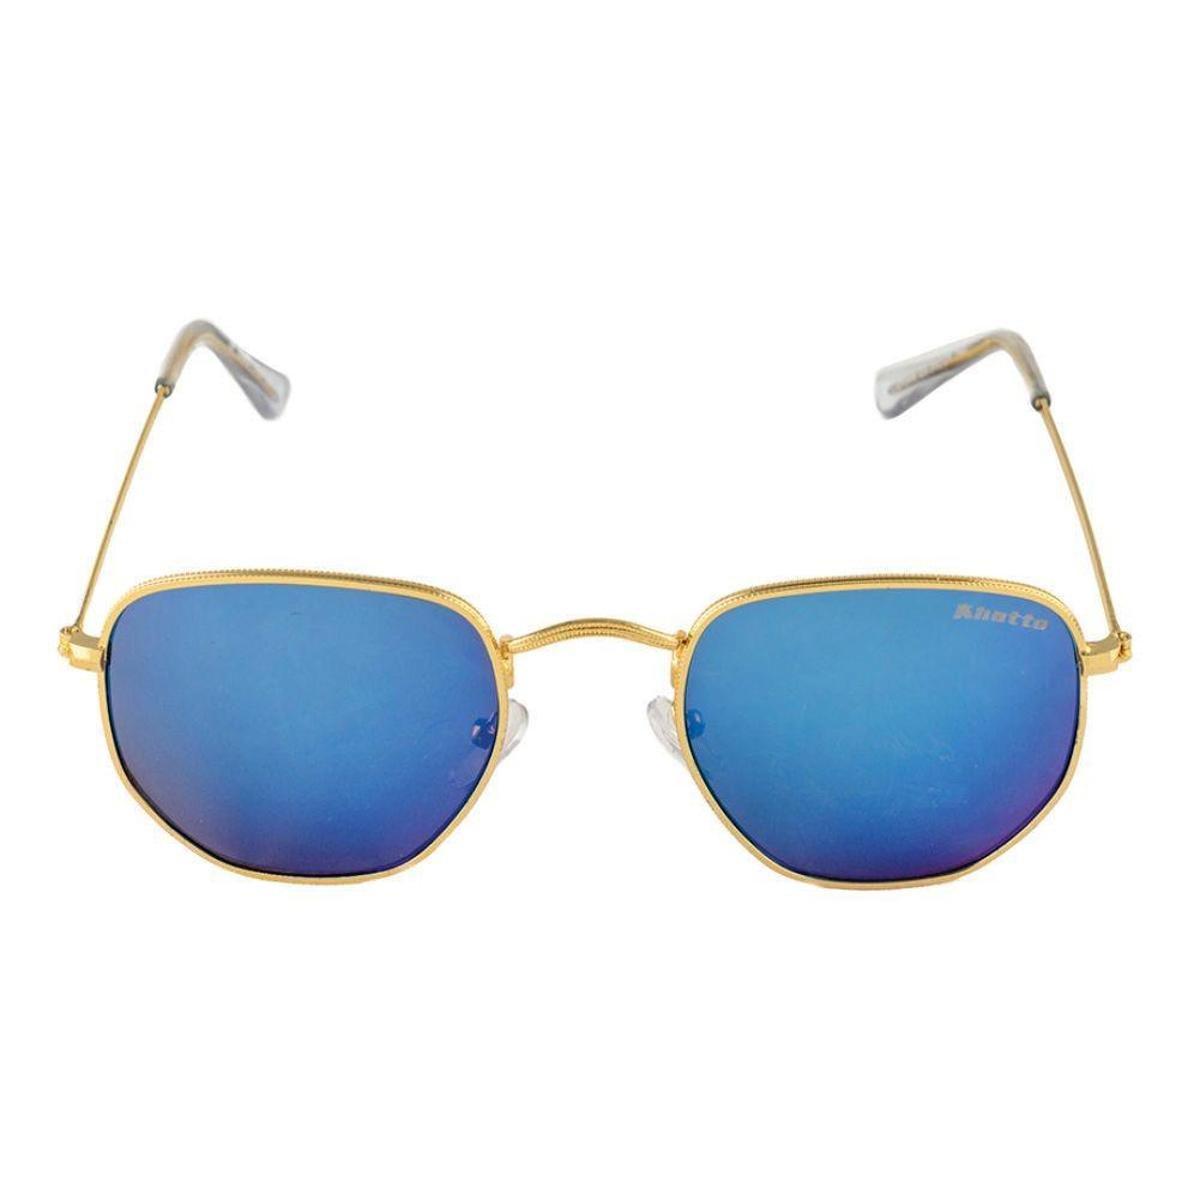 6a25cad51 Óculos de Sol Khatto Fusion Round Masculino - Dourado | Zattini